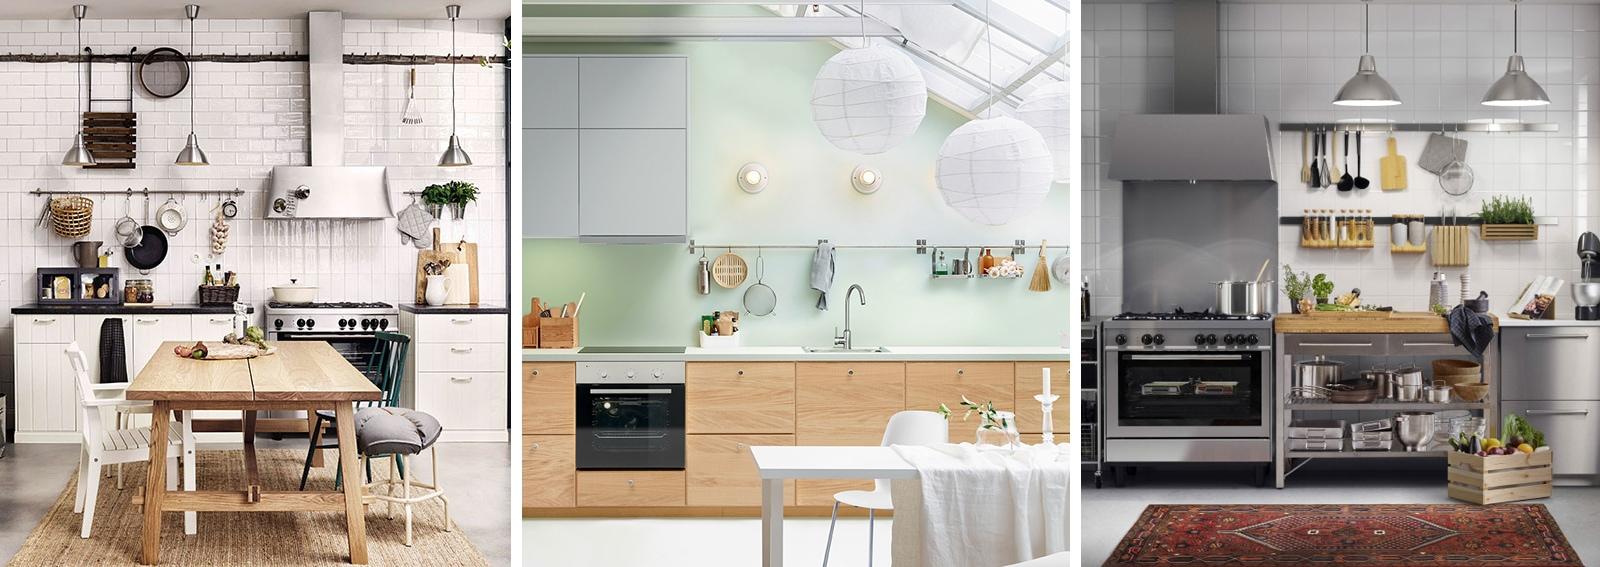 Awesome Configuratore Cucine Ikea Contemporary - Home Design Ideas ...